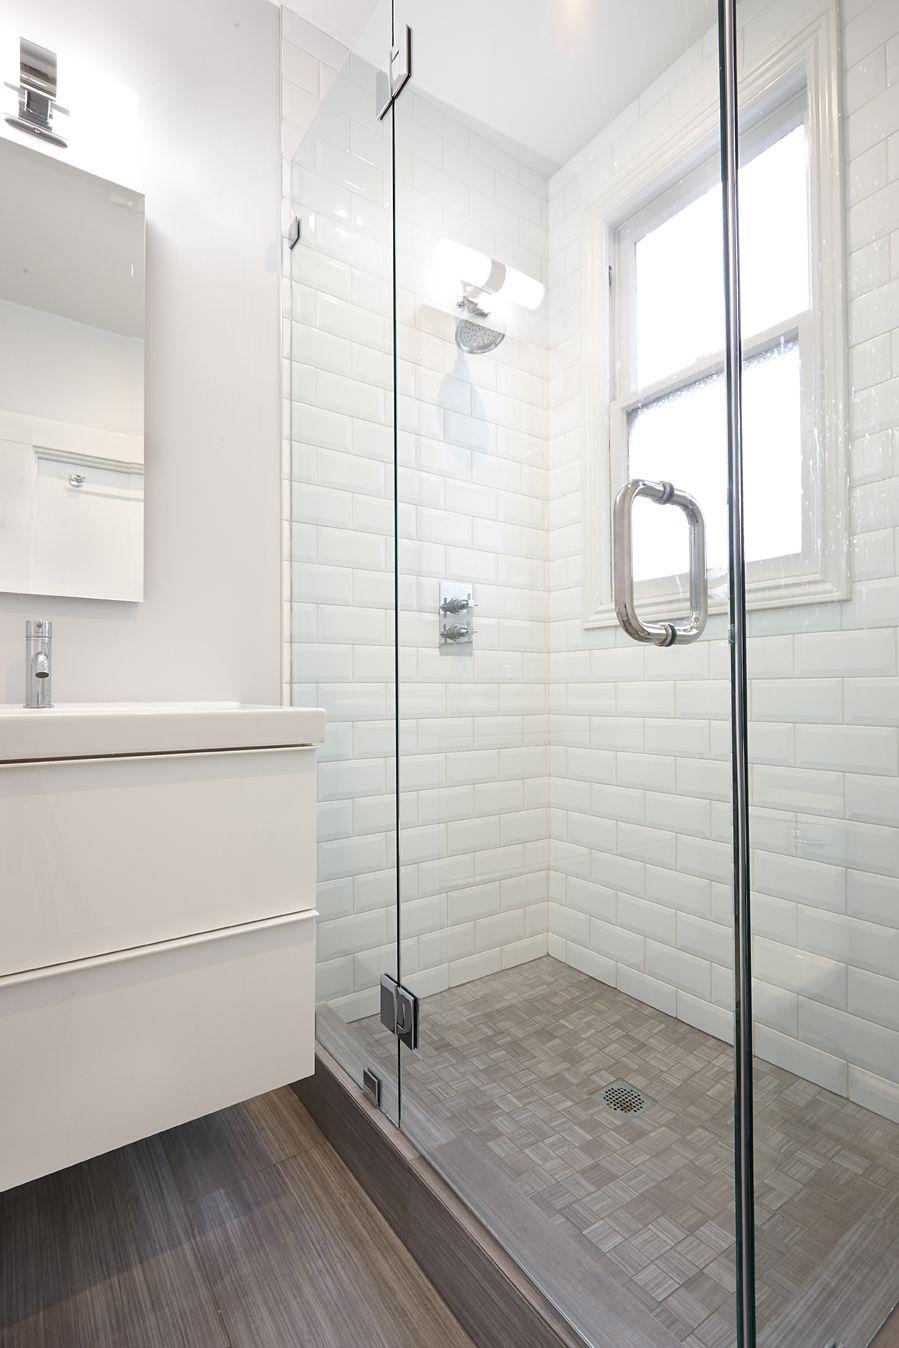 Beveled White Subway Tile With Grey Floor Nerland Sf Bathroom